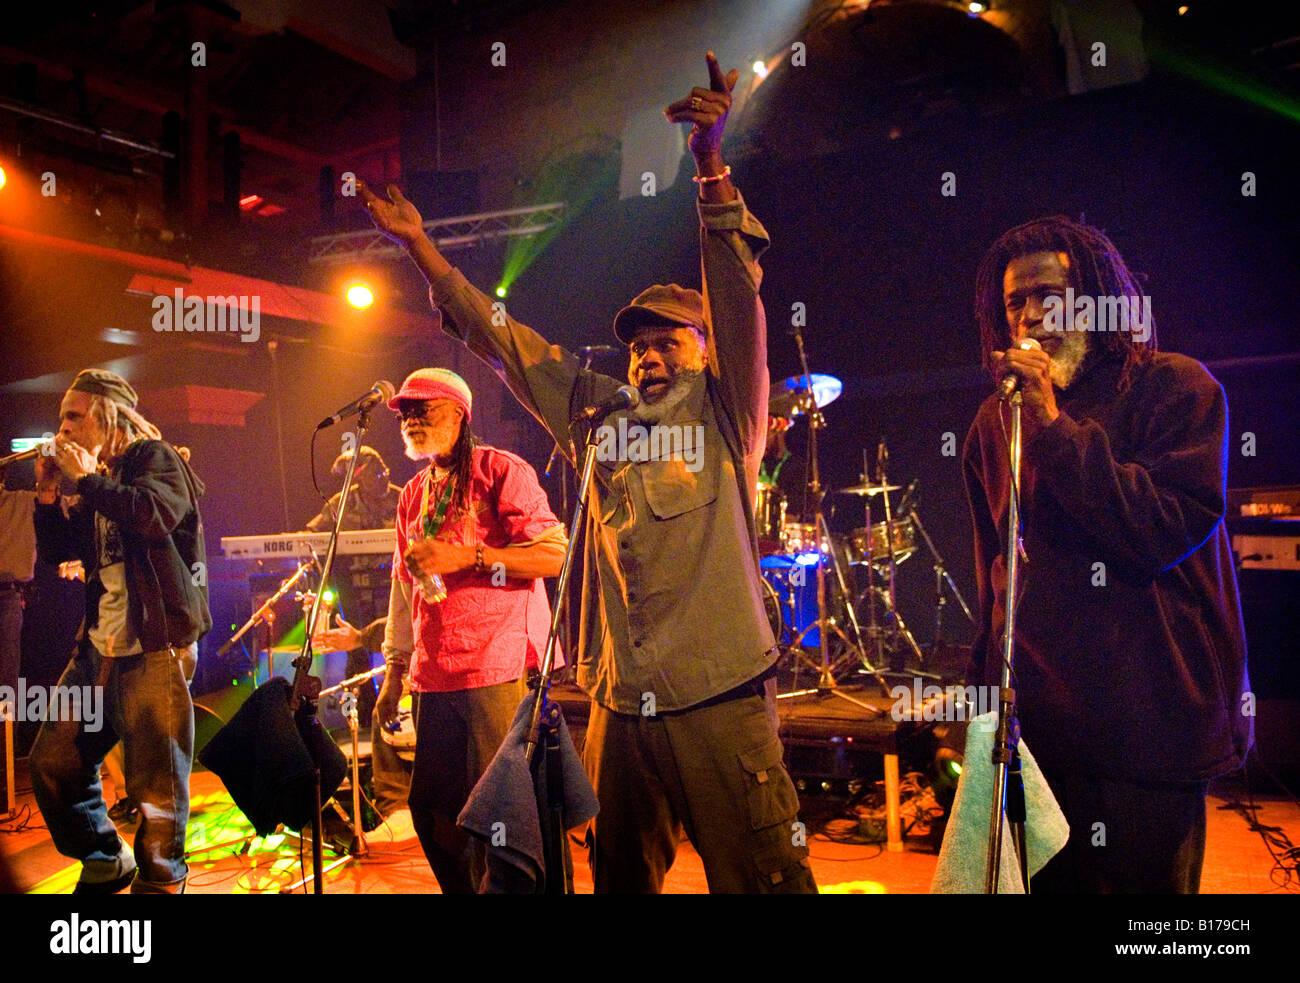 Reggae band The Congos in concert at The Buttermarket, Shrewsbury, England, November 2006 - Stock Image